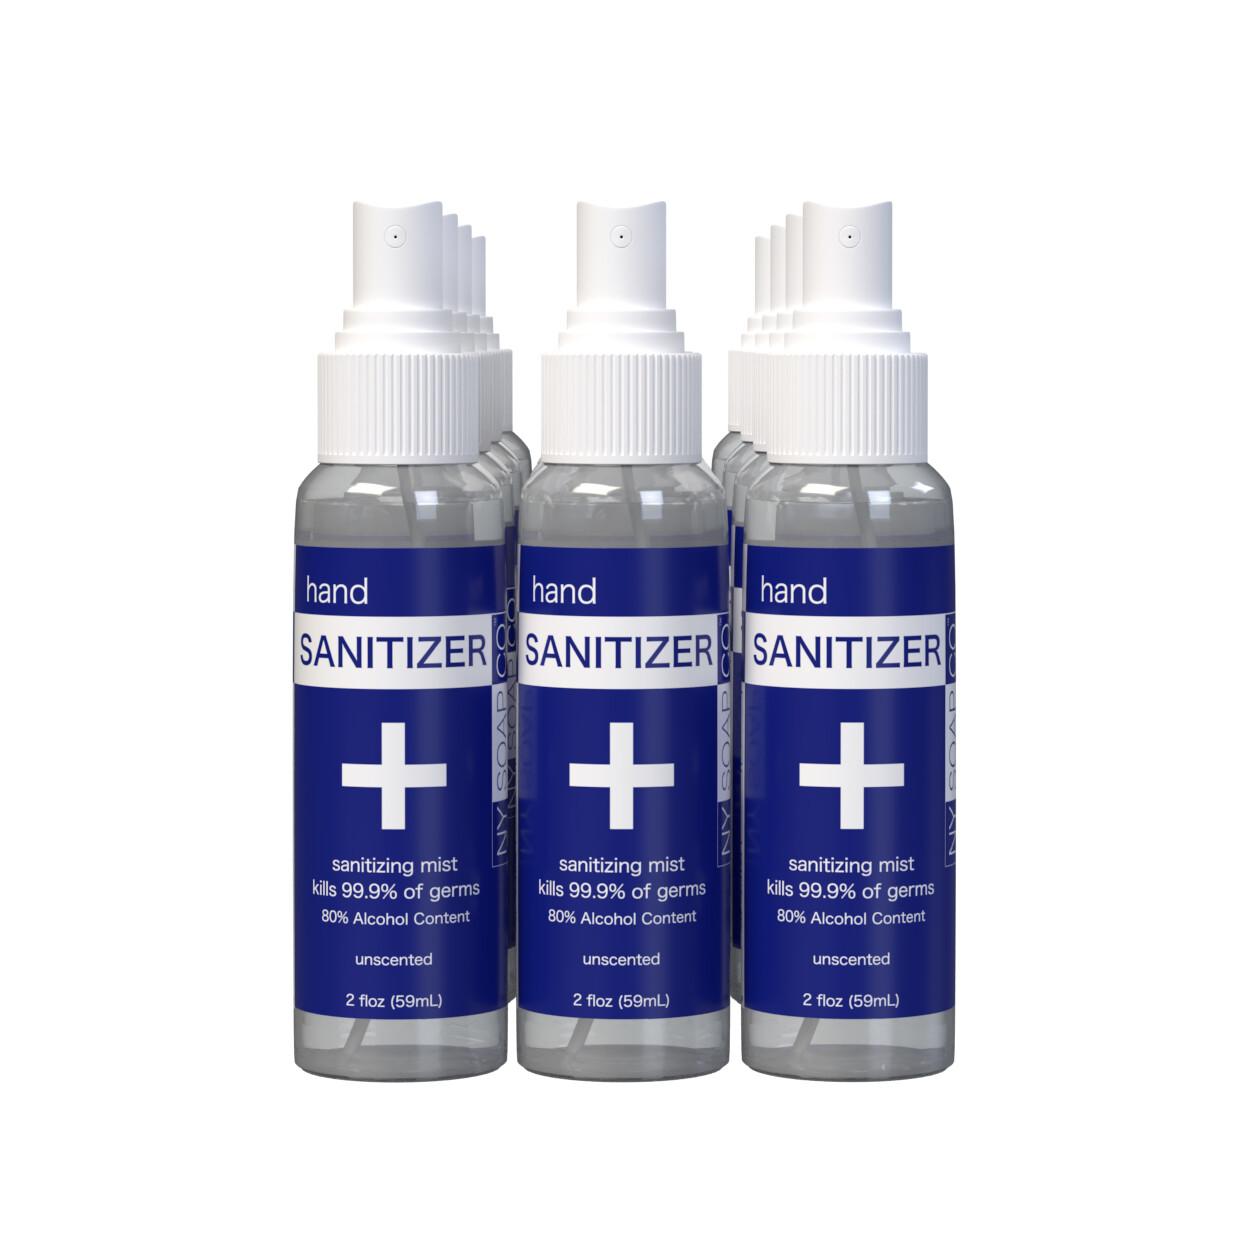 2oz Spray Bottle Case (12-36 Bottles/Case)